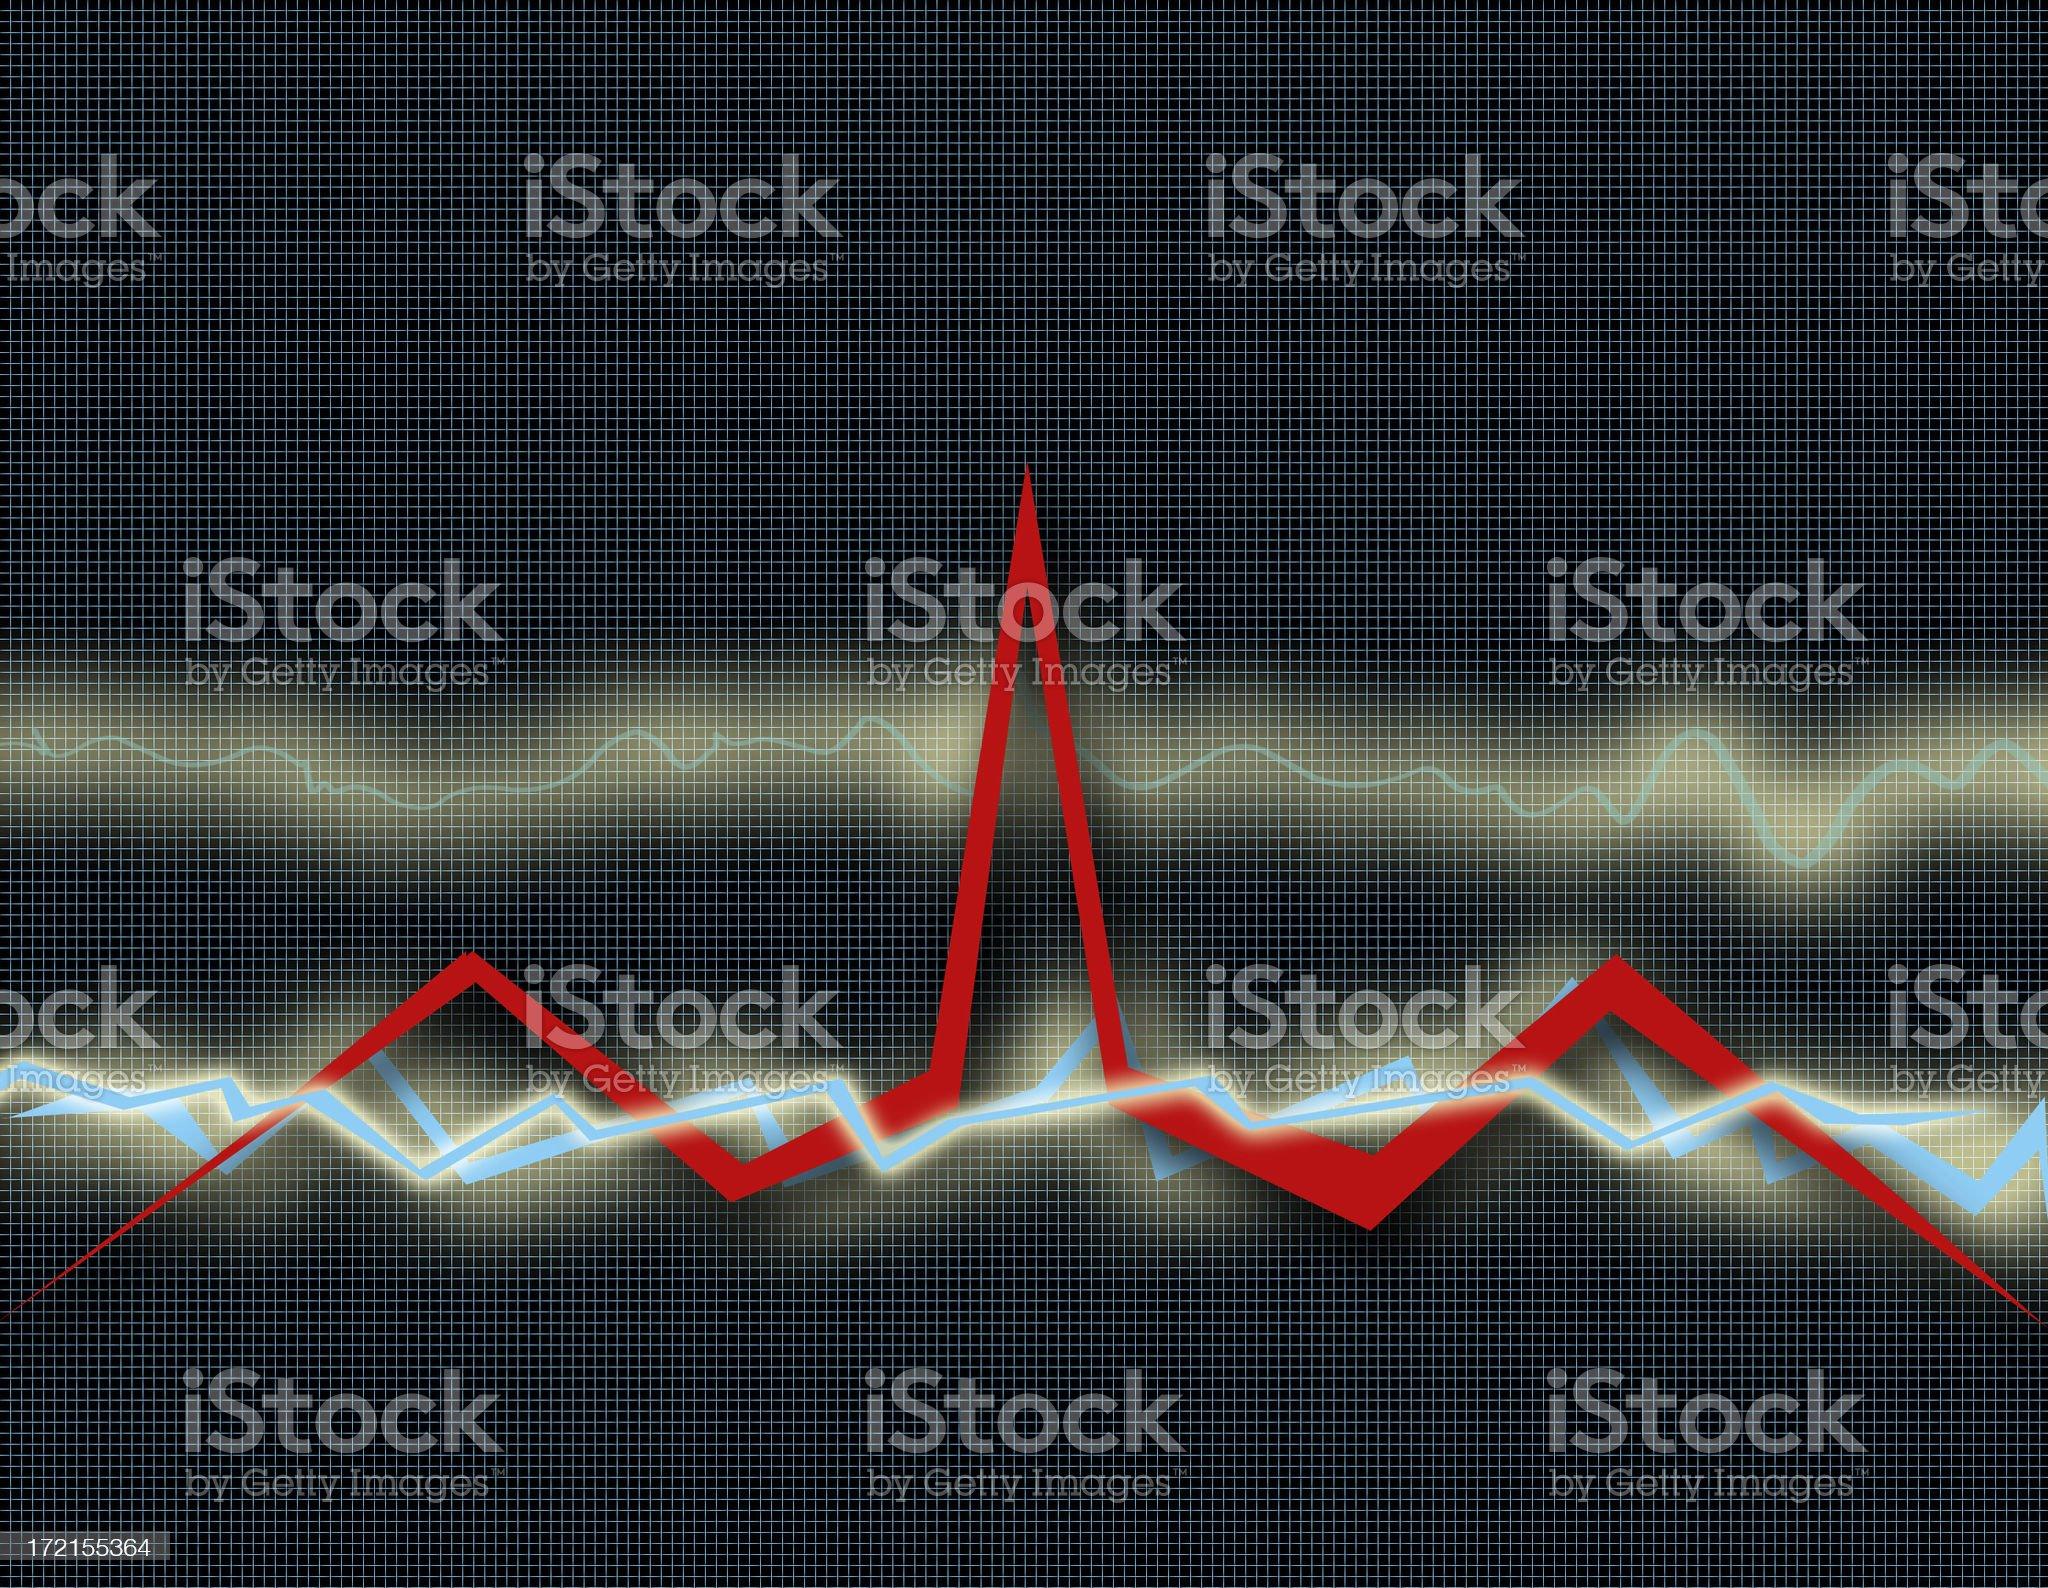 Cardio EKG Health Chart - Healthcare (Part 3) royalty-free stock photo